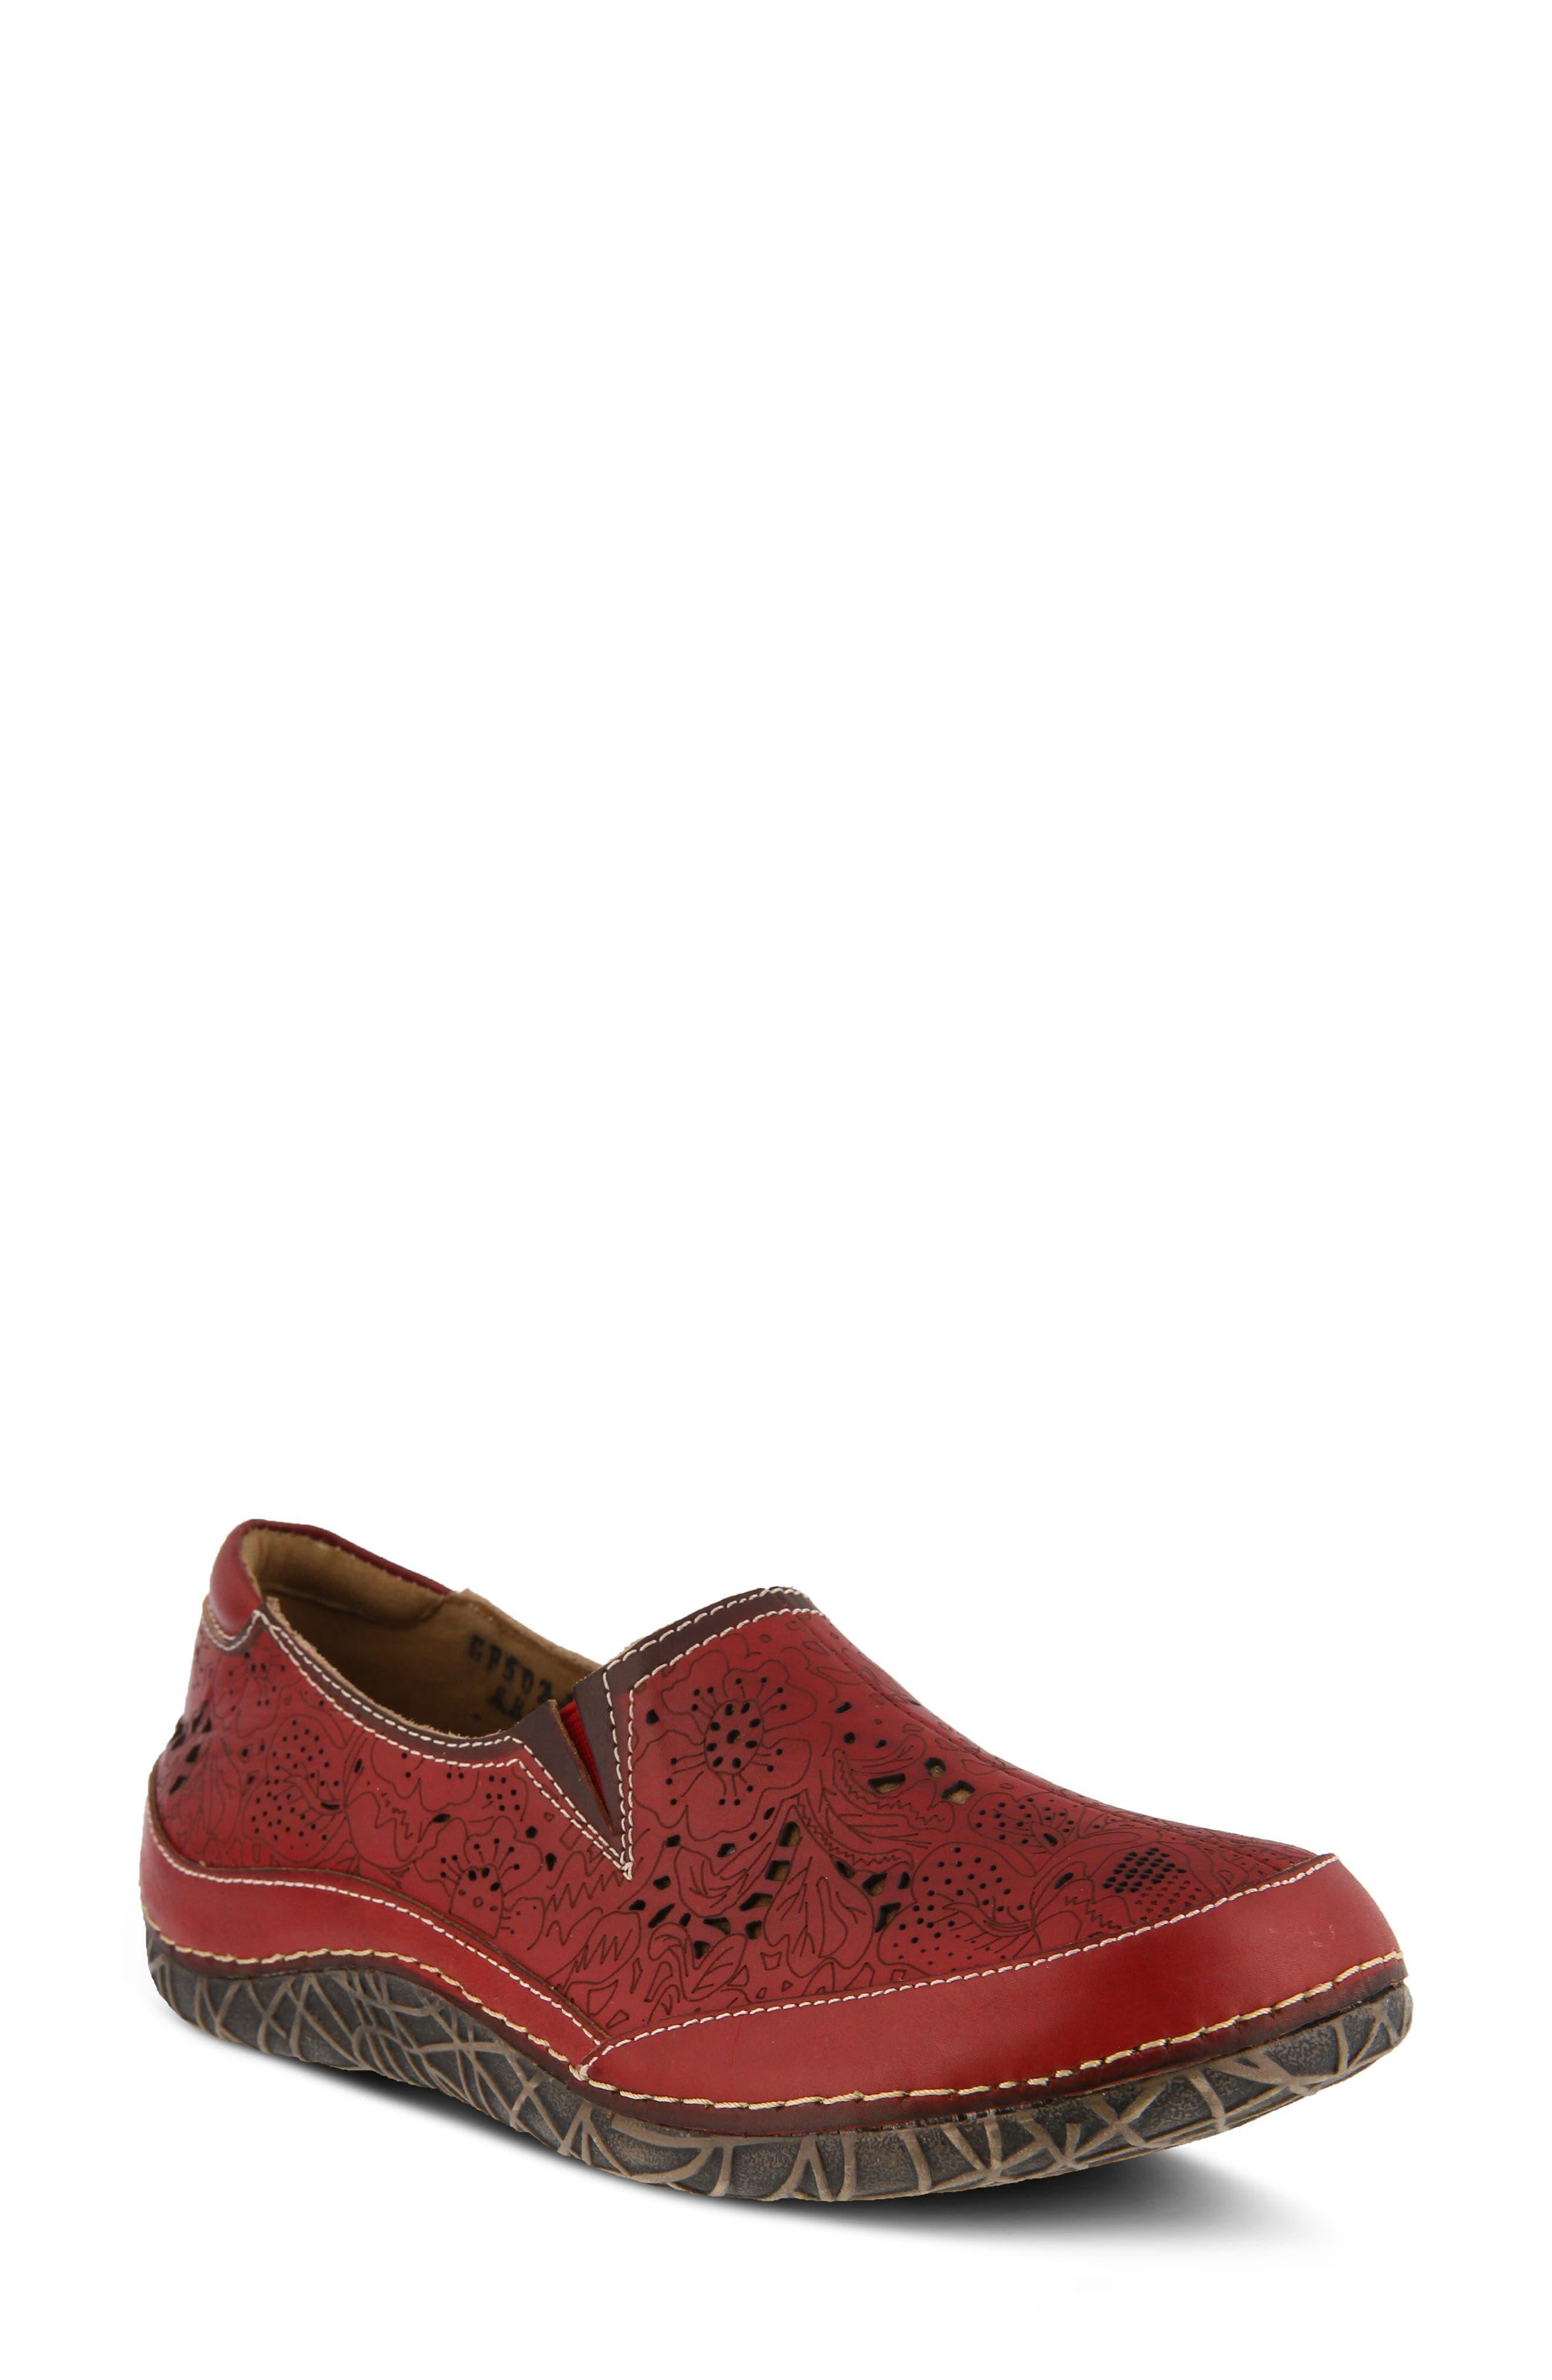 L'Artiste Libora Slip-On Flat,                             Main thumbnail 1, color,                             Red Leather